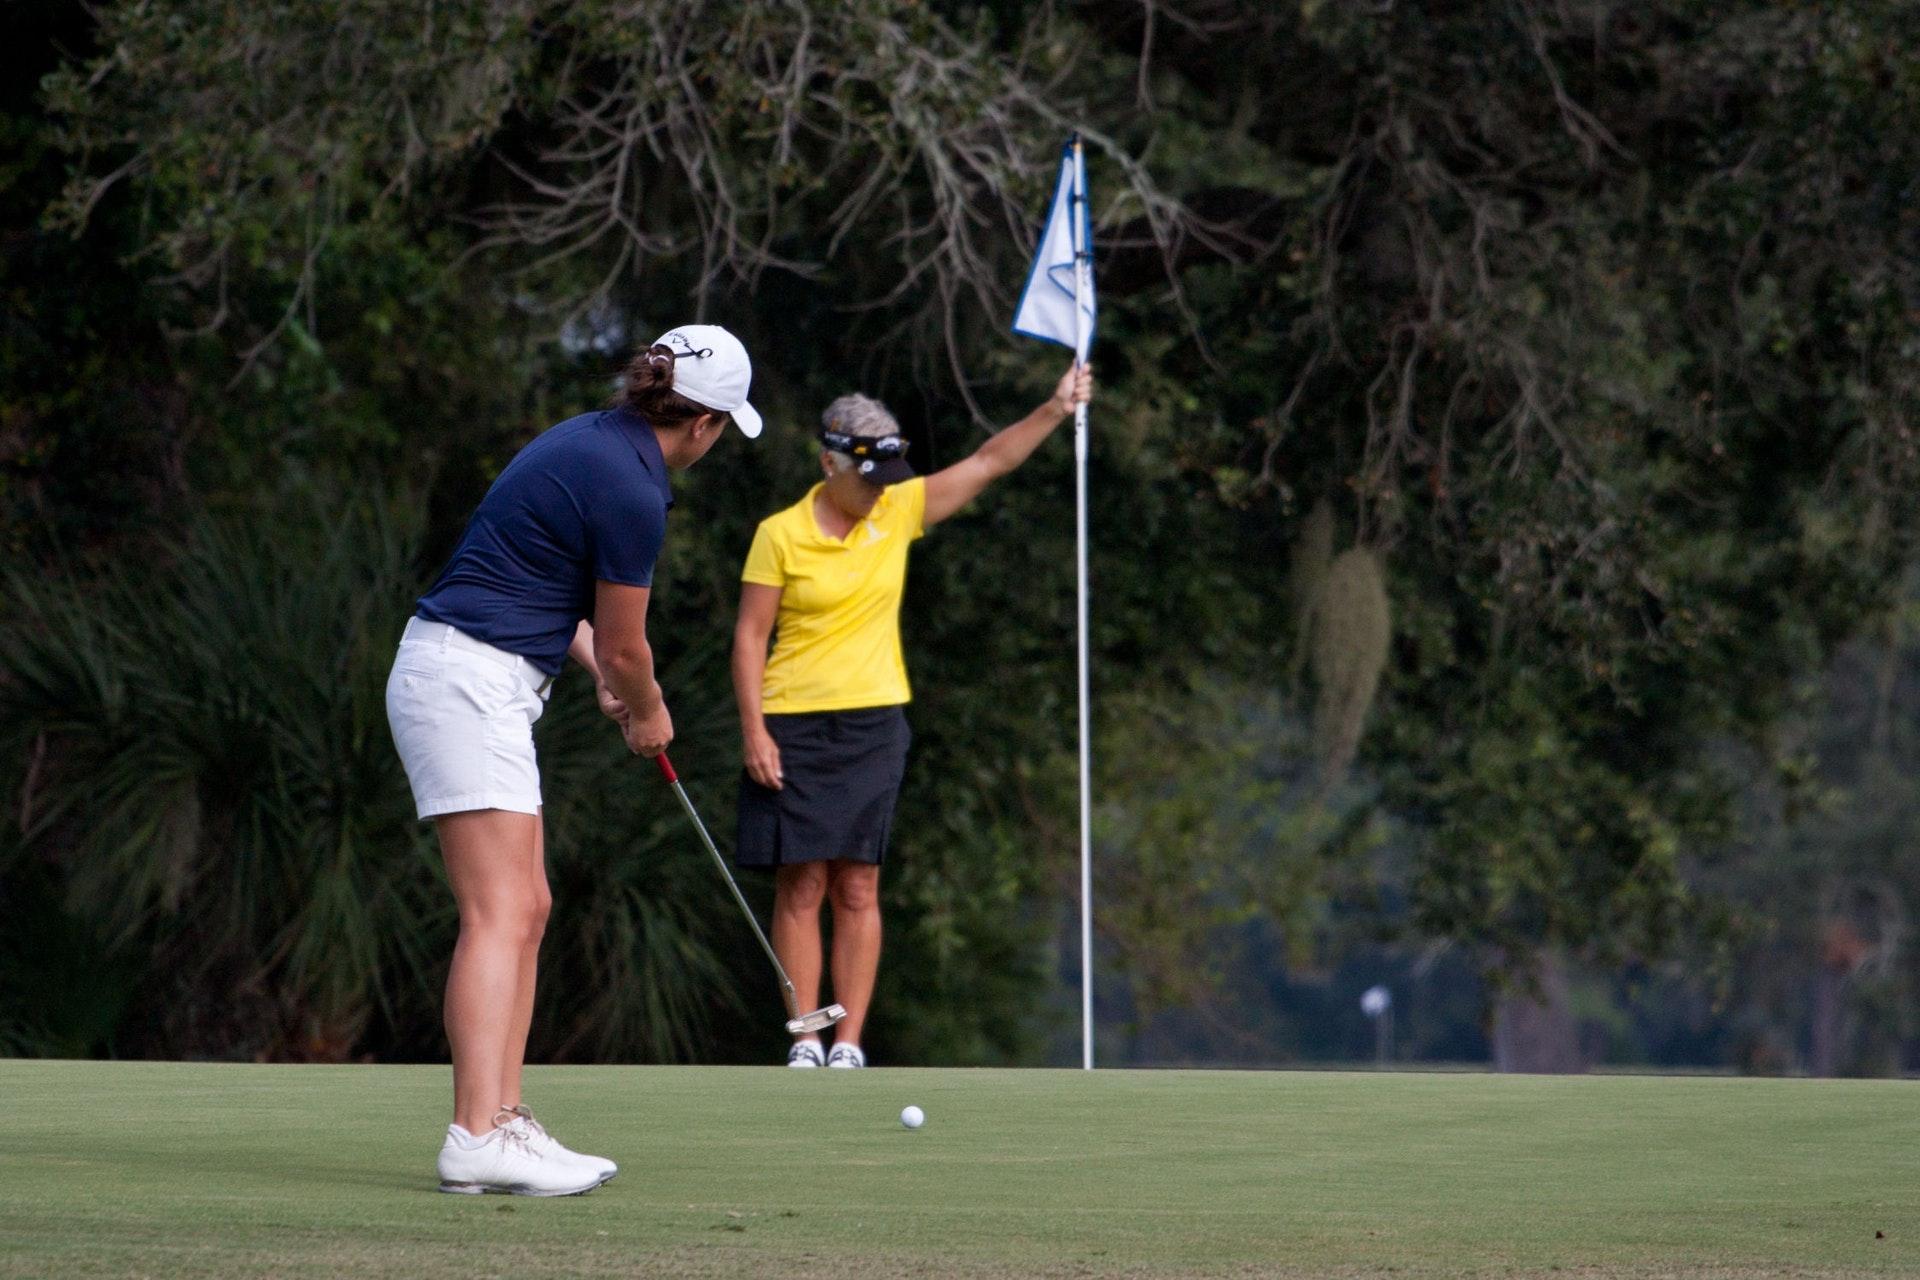 Two women playing golf